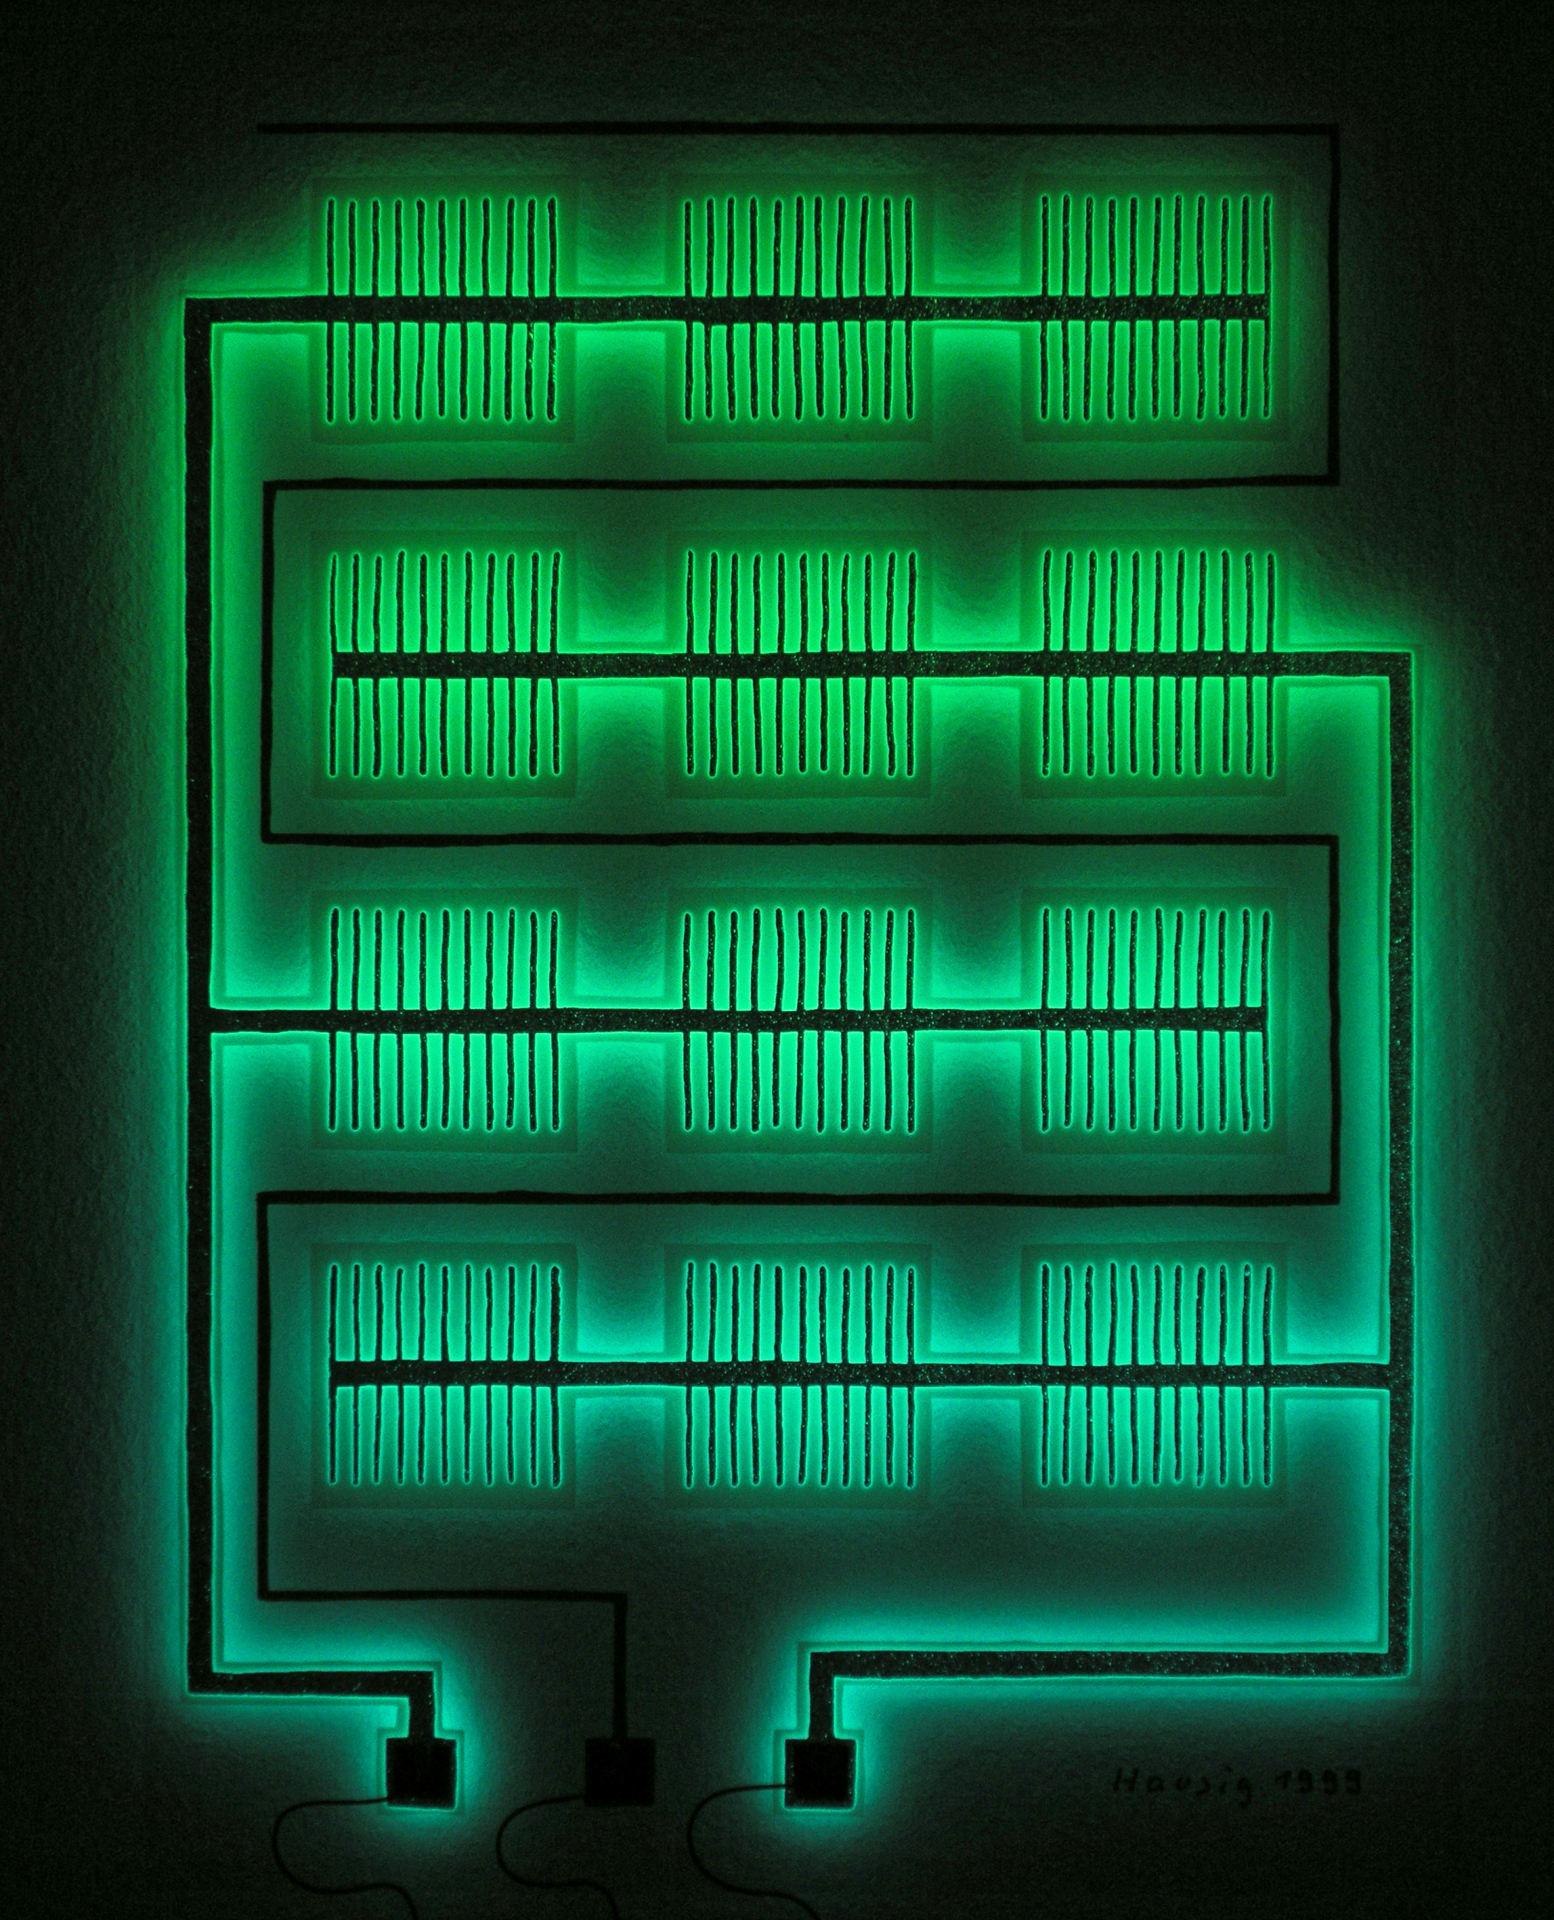 daniel_hausig_prototypen_fuer_den_stromdiebstahl_2000_light-art-installation